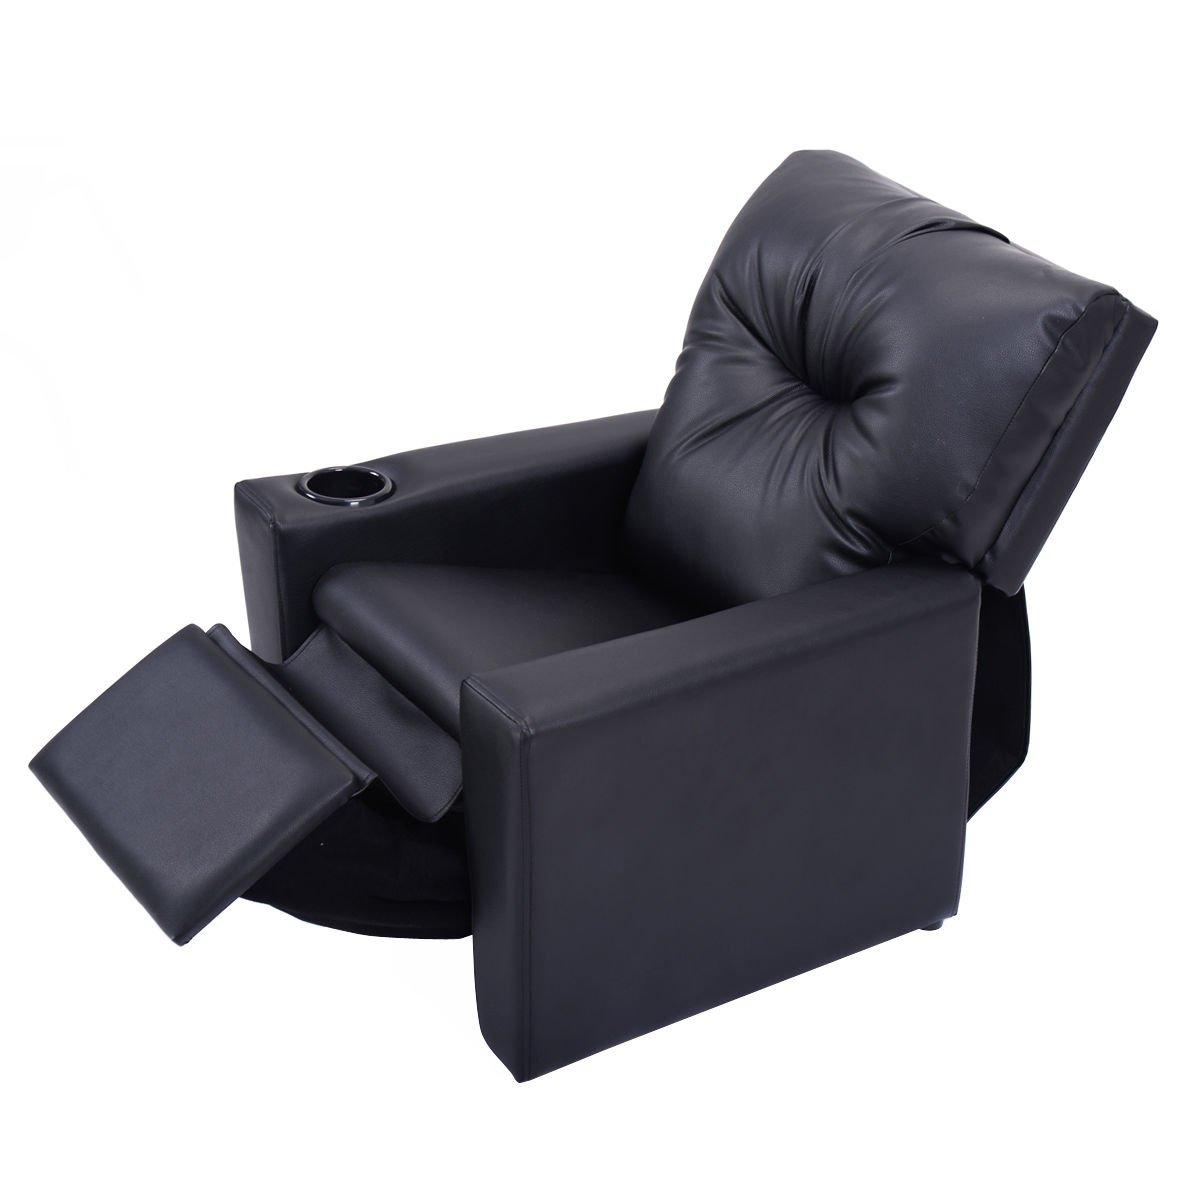 Black Multi Functional Kids Manual Recliner Sofa PU Leather Ergonomic Lounge w/ Cup Holder Capacity 110 Lbs